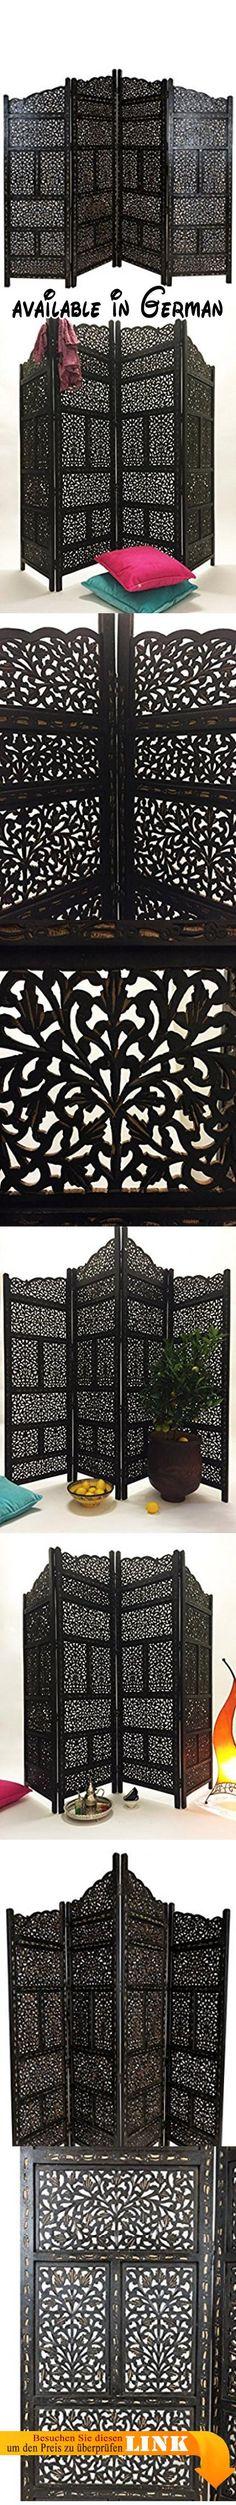 Saraswati Saraswati Devi Pinterest - terrasse paravent sichtschutz